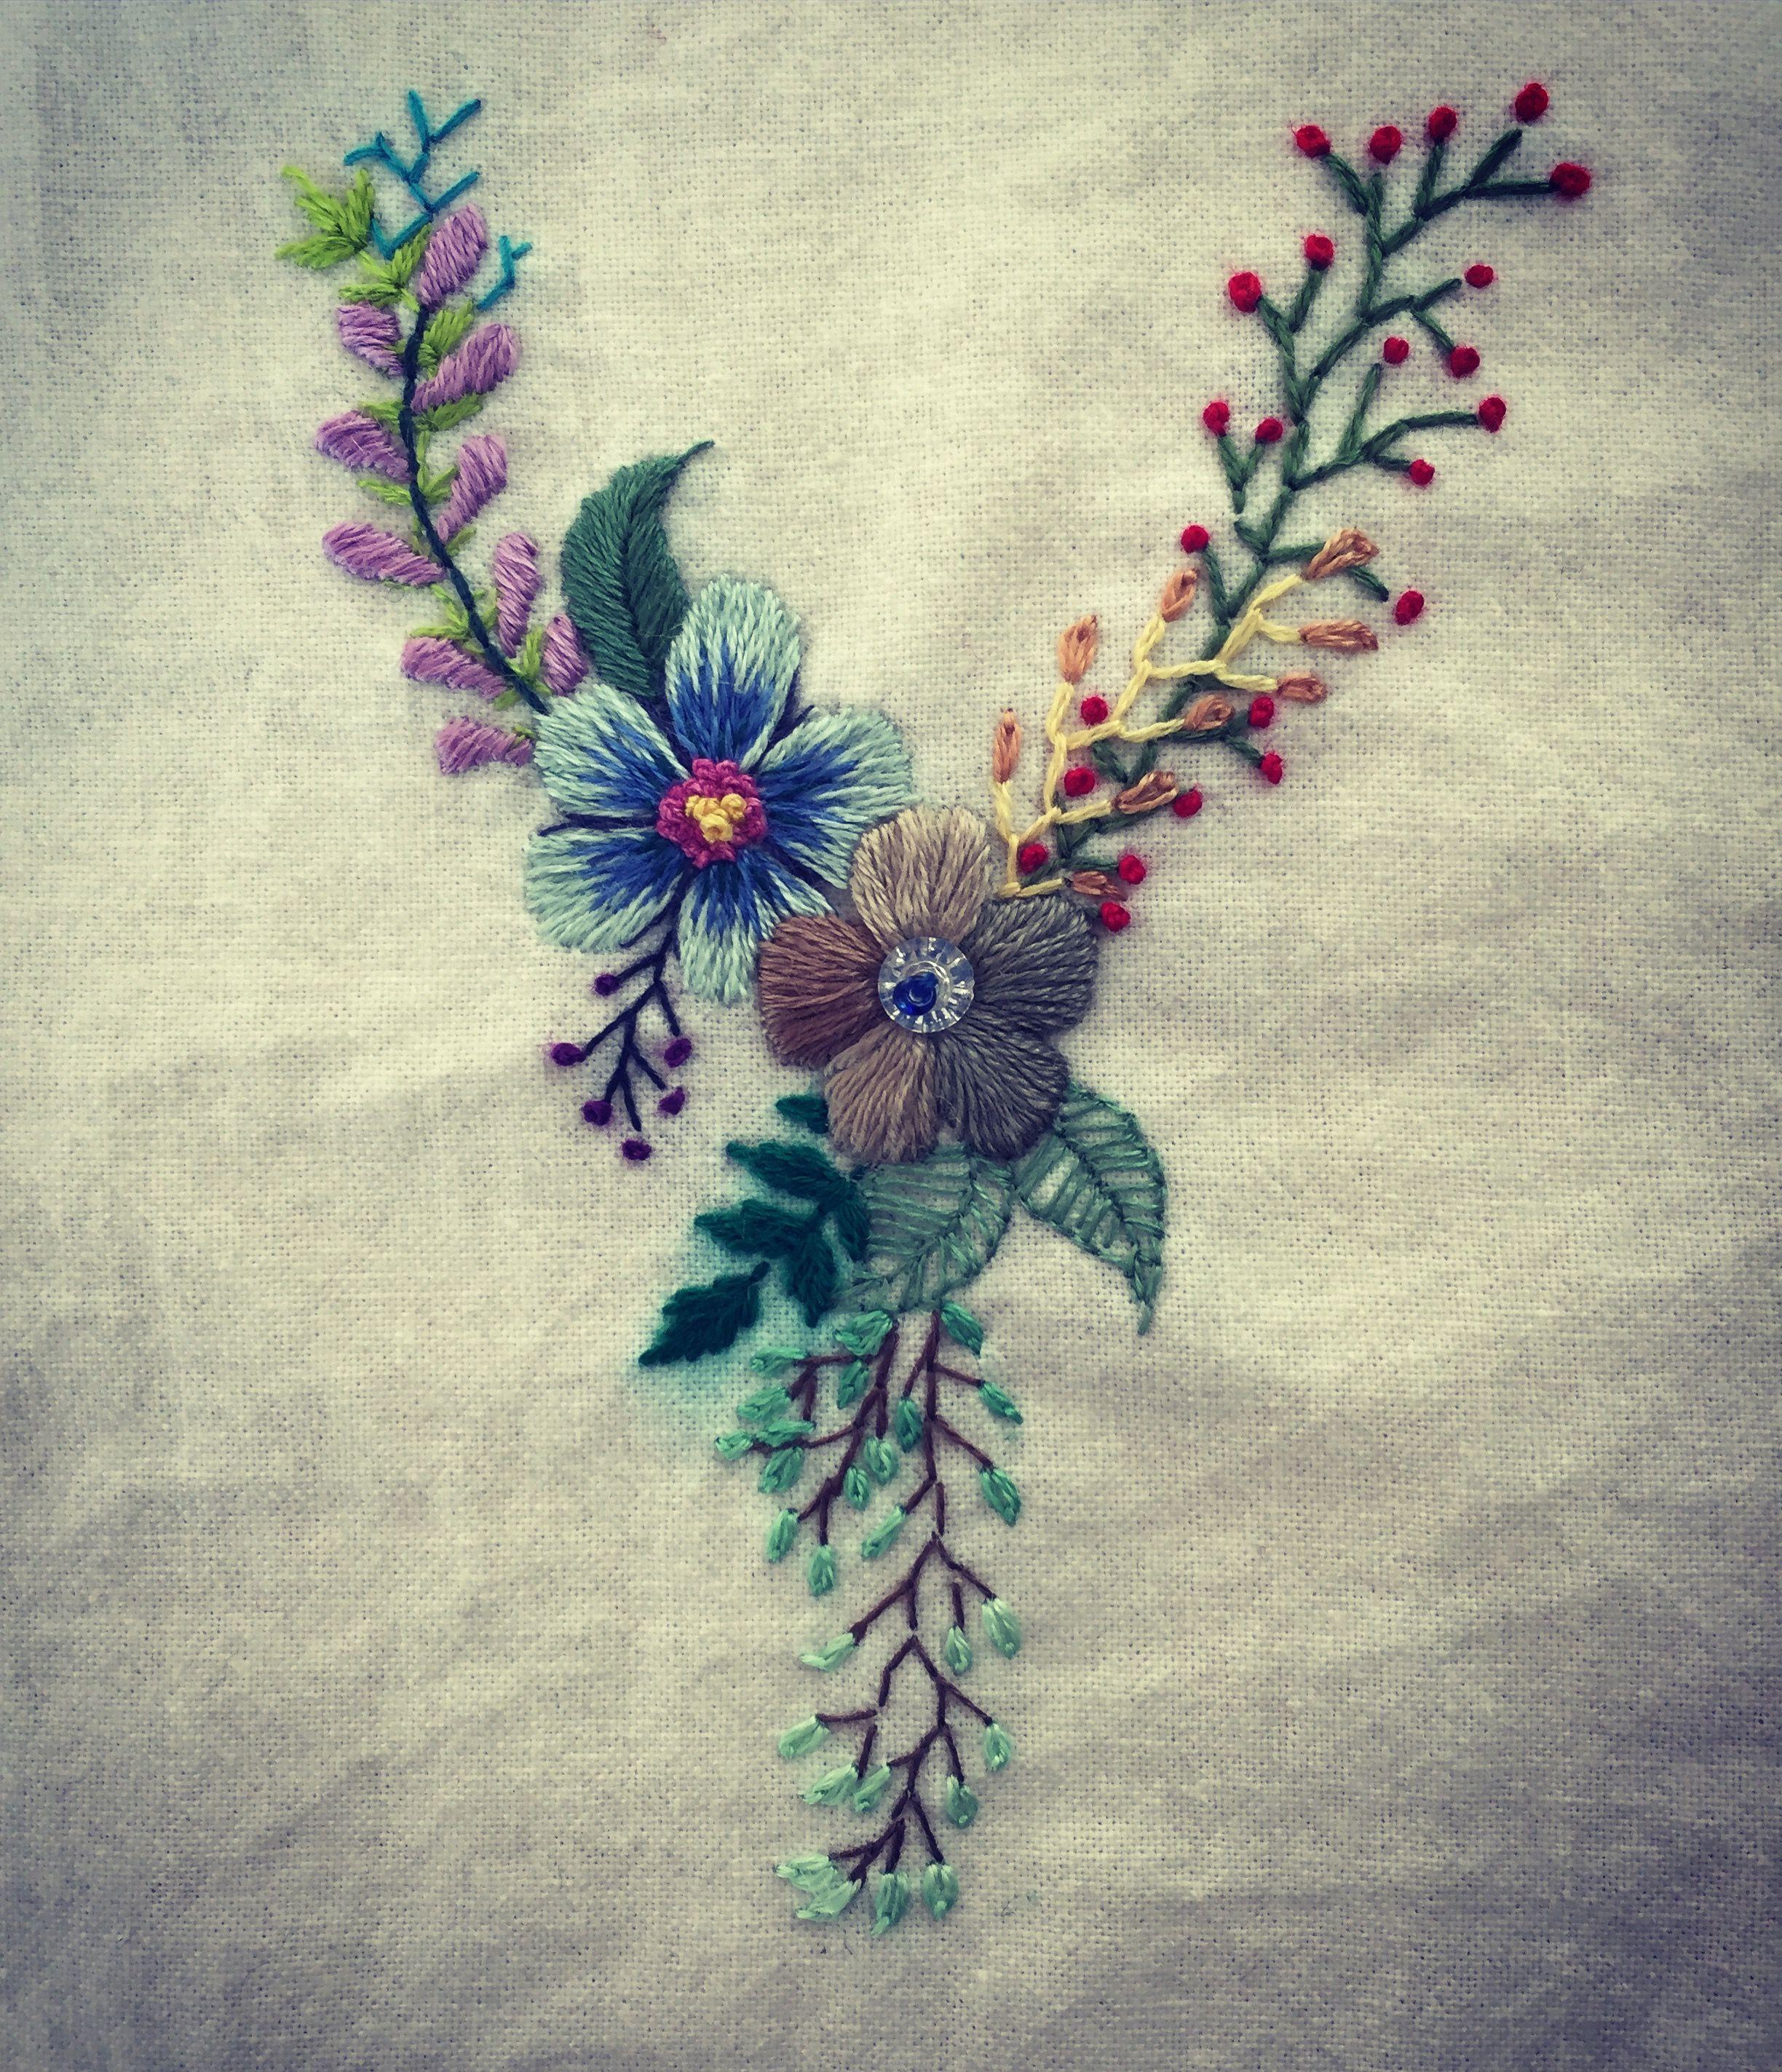 Hand embroidered by Nina Letter Y Based on Megan Wells's illustration